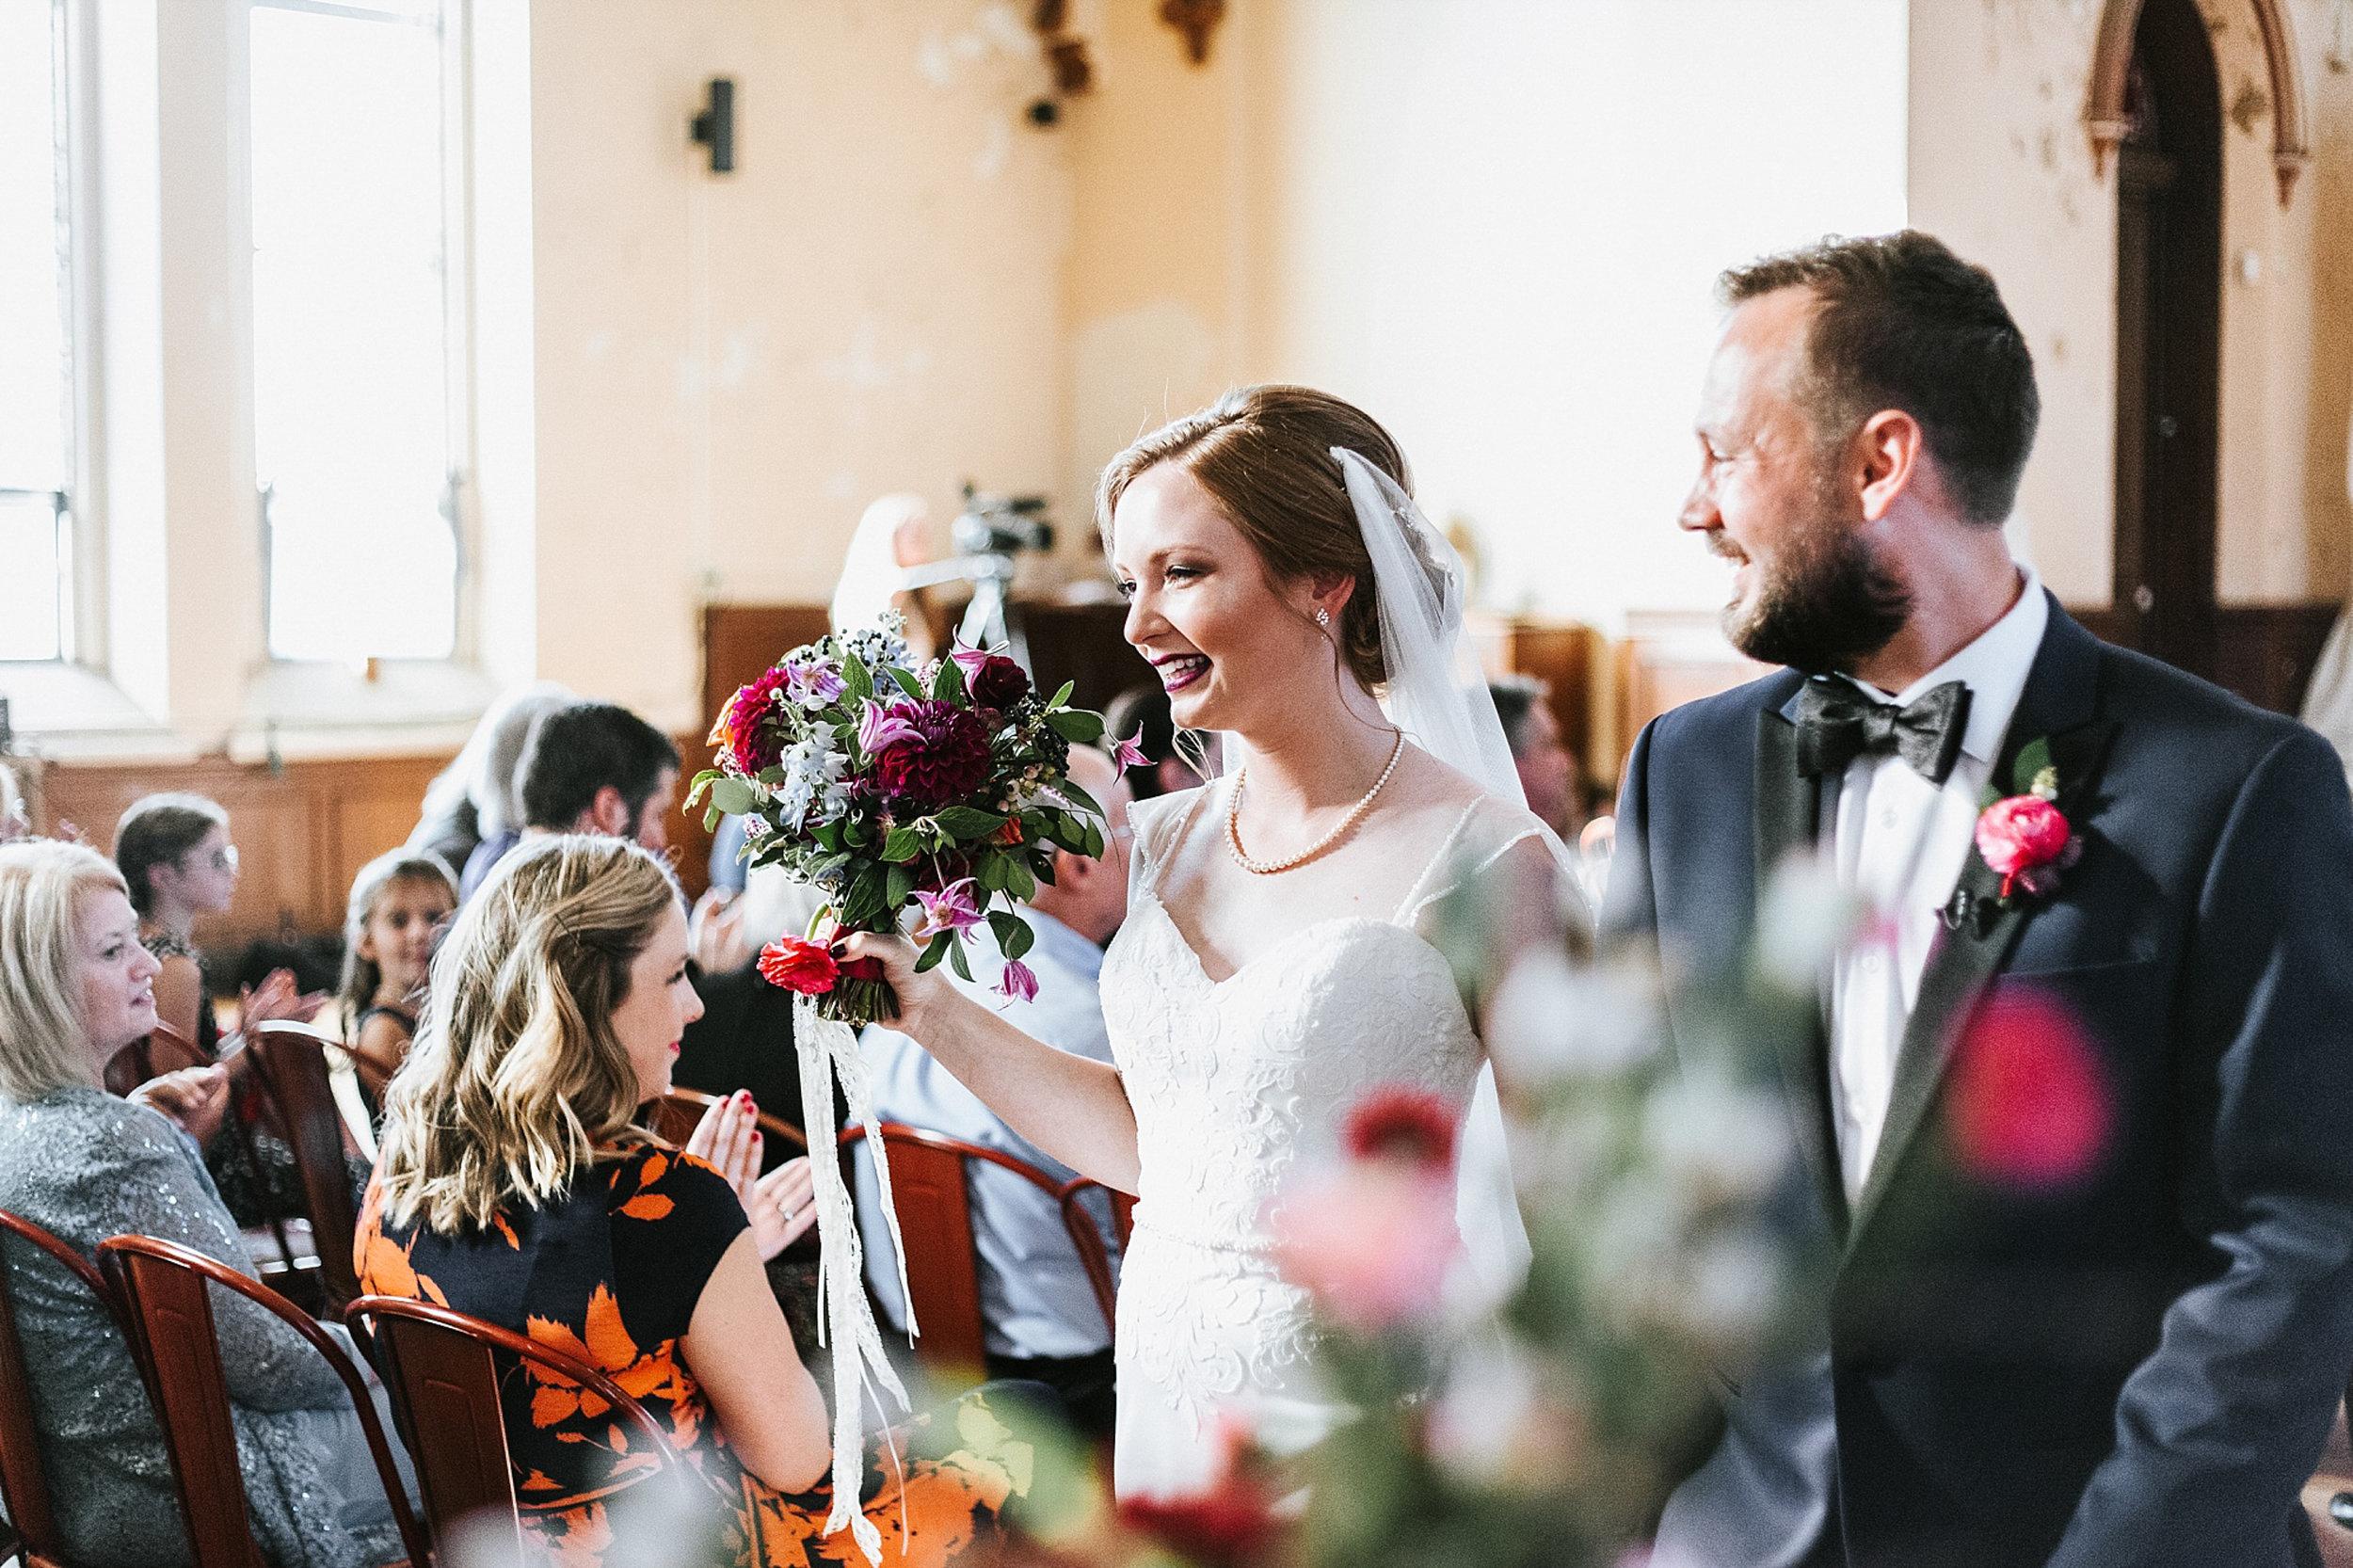 Brooke Townsend Photography - Ohio Wedding Photographer-140.jpg